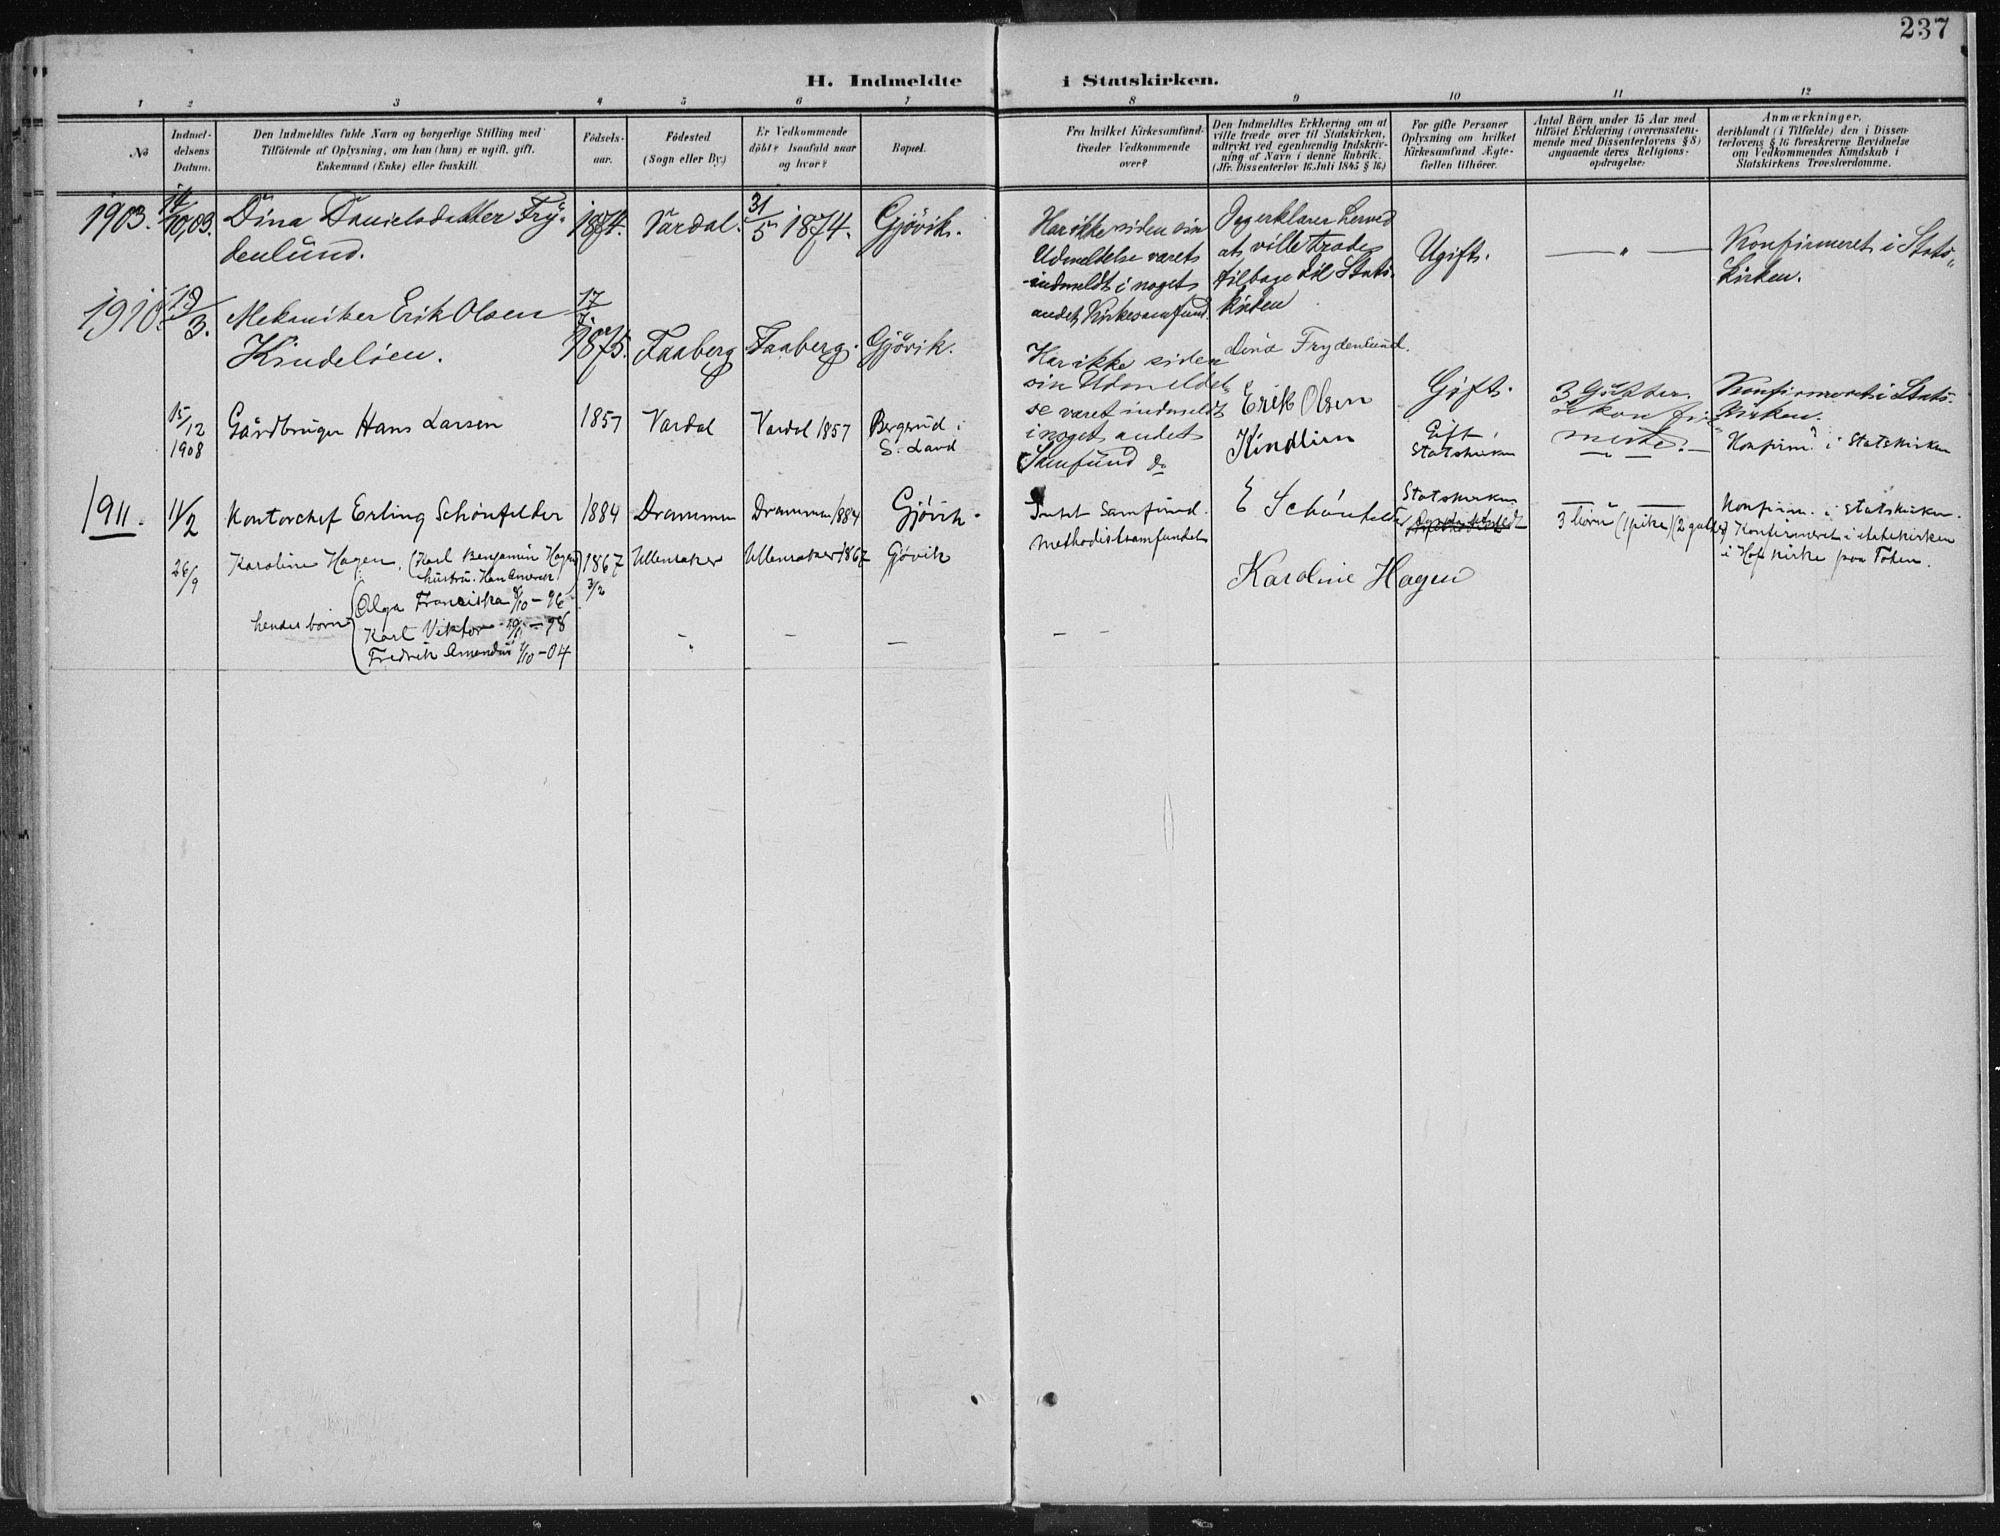 SAH, Vardal prestekontor, H/Ha/Haa/L0013: Ministerialbok nr. 13, 1901-1911, s. 237